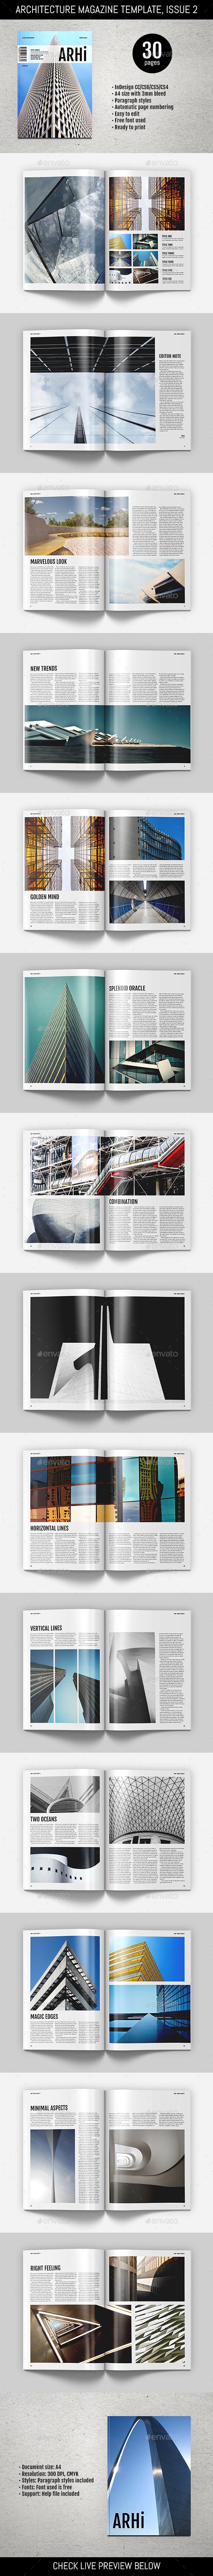 Architecture Magazine Template - Magazines Print Templates